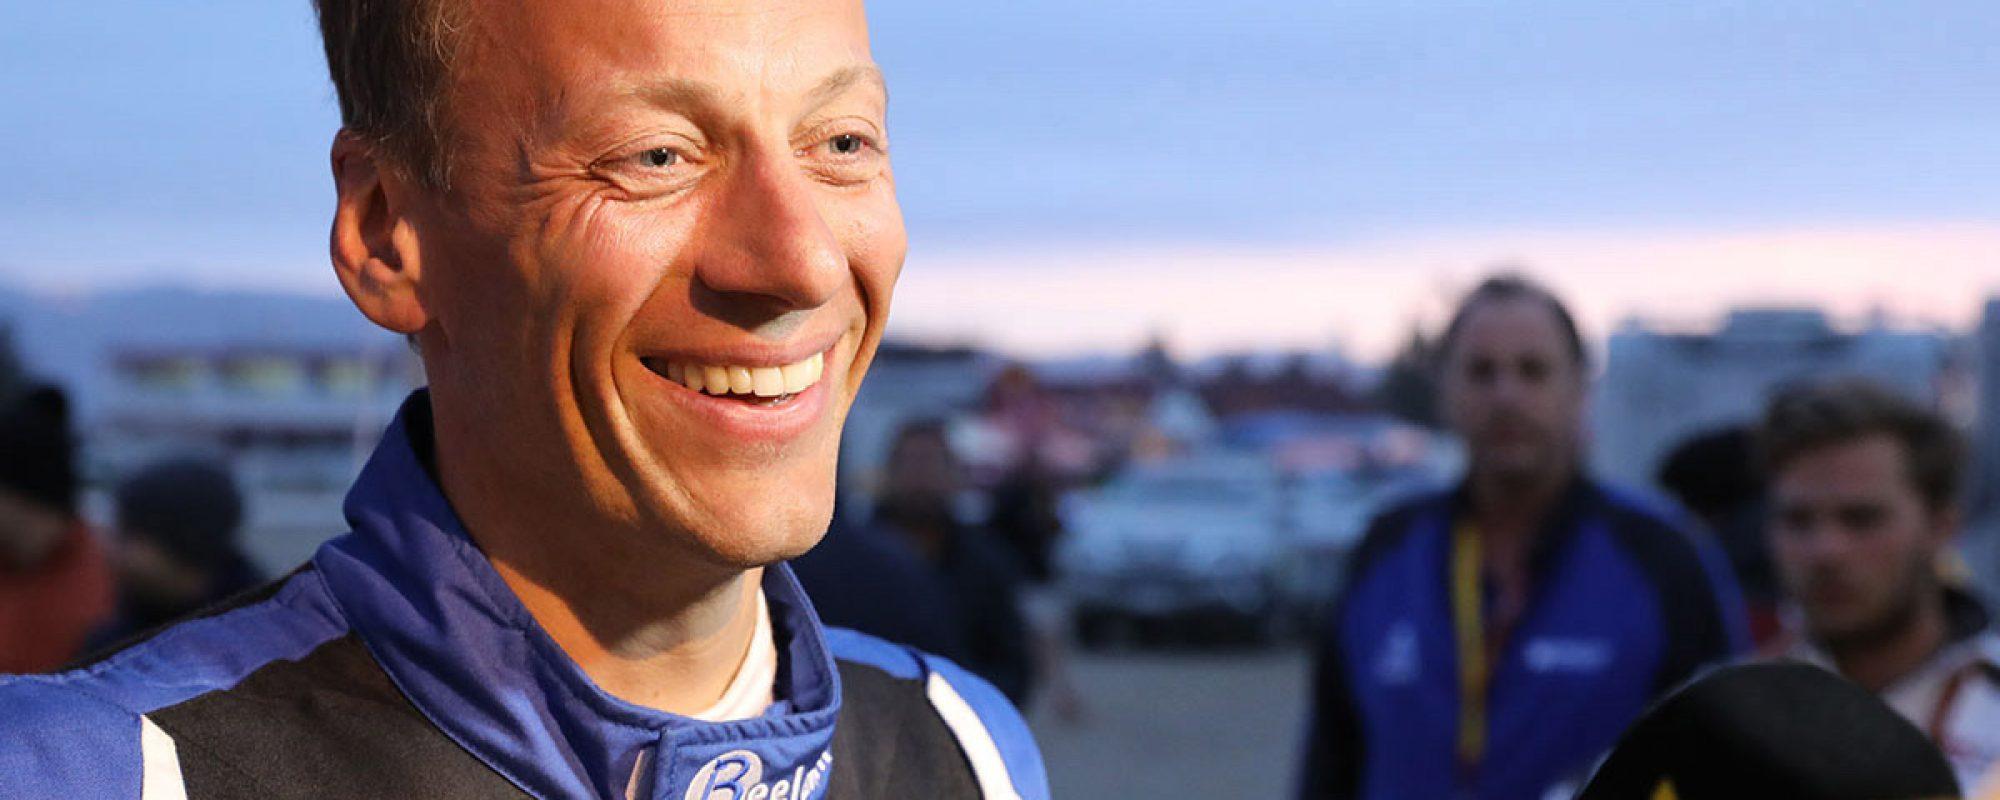 Bernhard ten Brinke opnieuw in Dakar Rally met Toyota Hilux